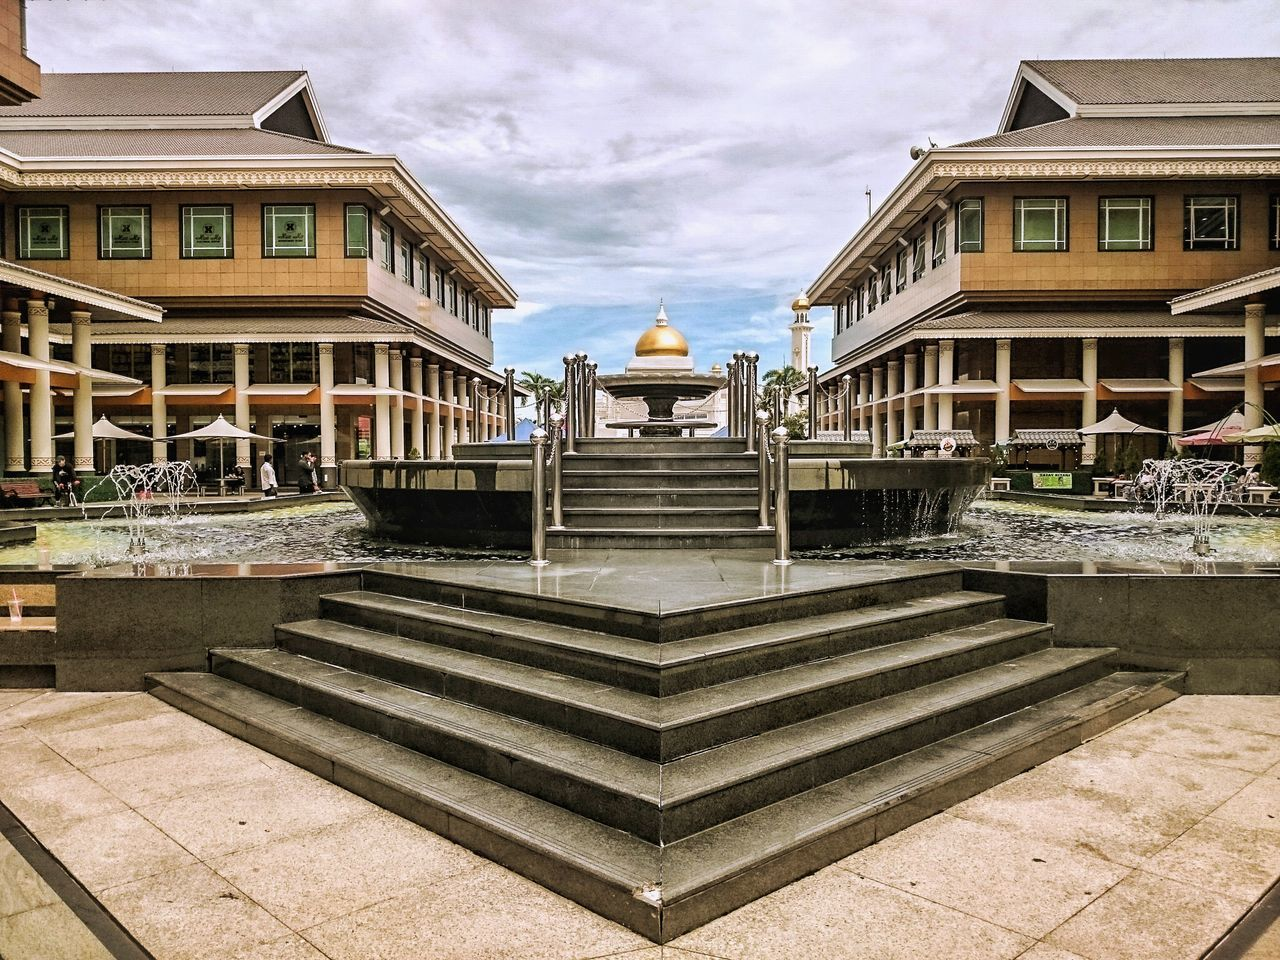 Brunei Darussalam Mobilephotography Sony Xperia Photography. Sonyxperiaz2 Sony Xperia Z2 Brunei